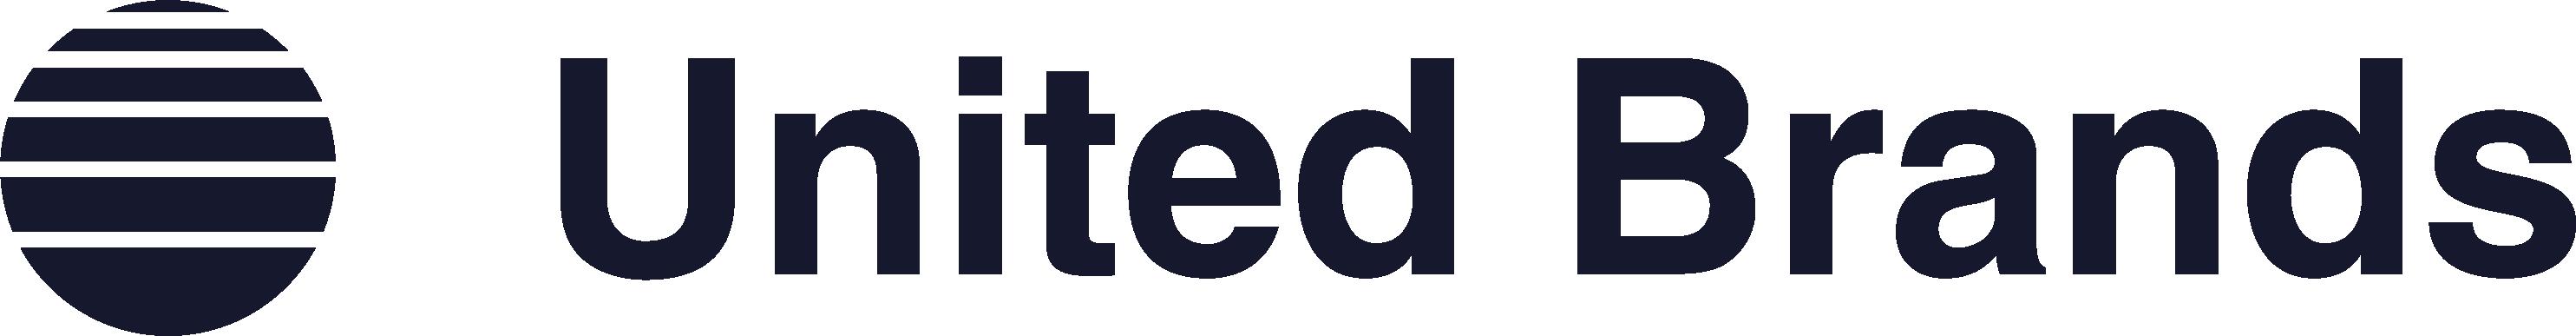 United Brands Marketing